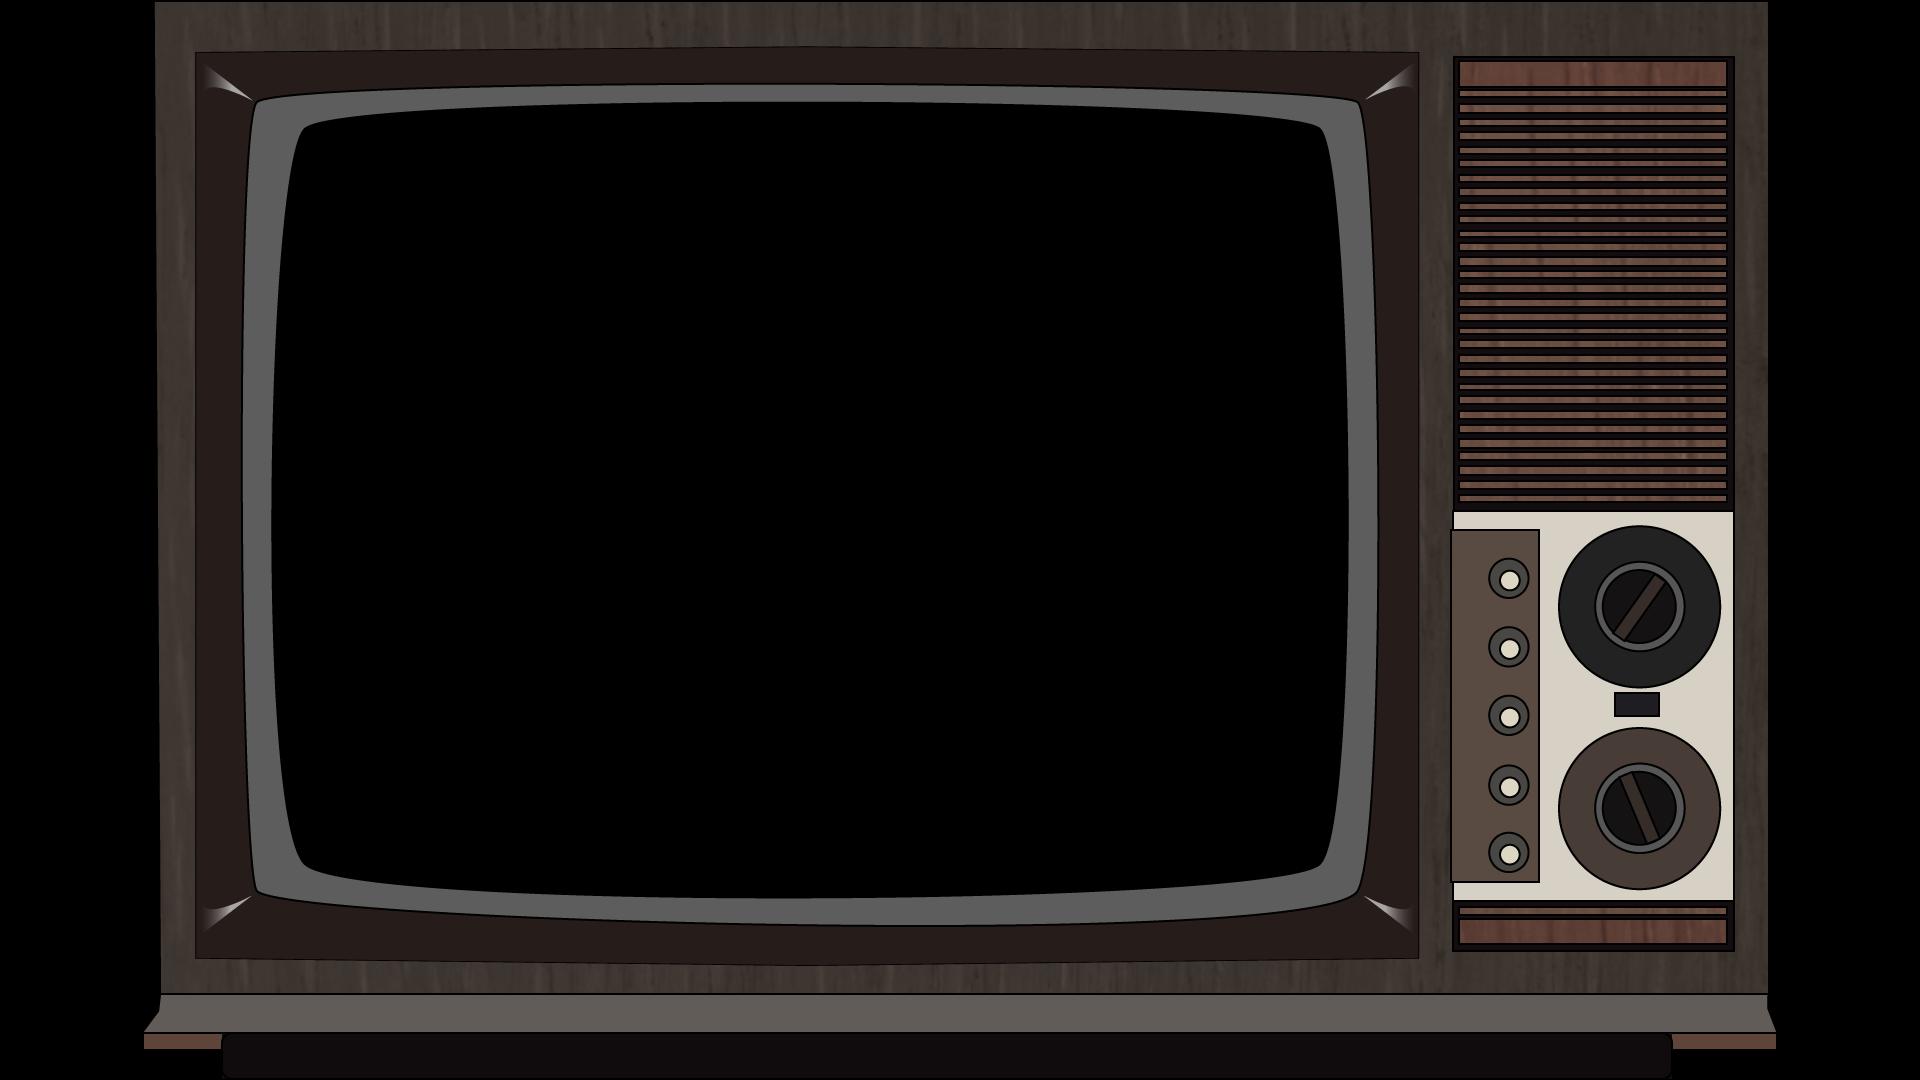 Old png image purepng. Television clipart tv set